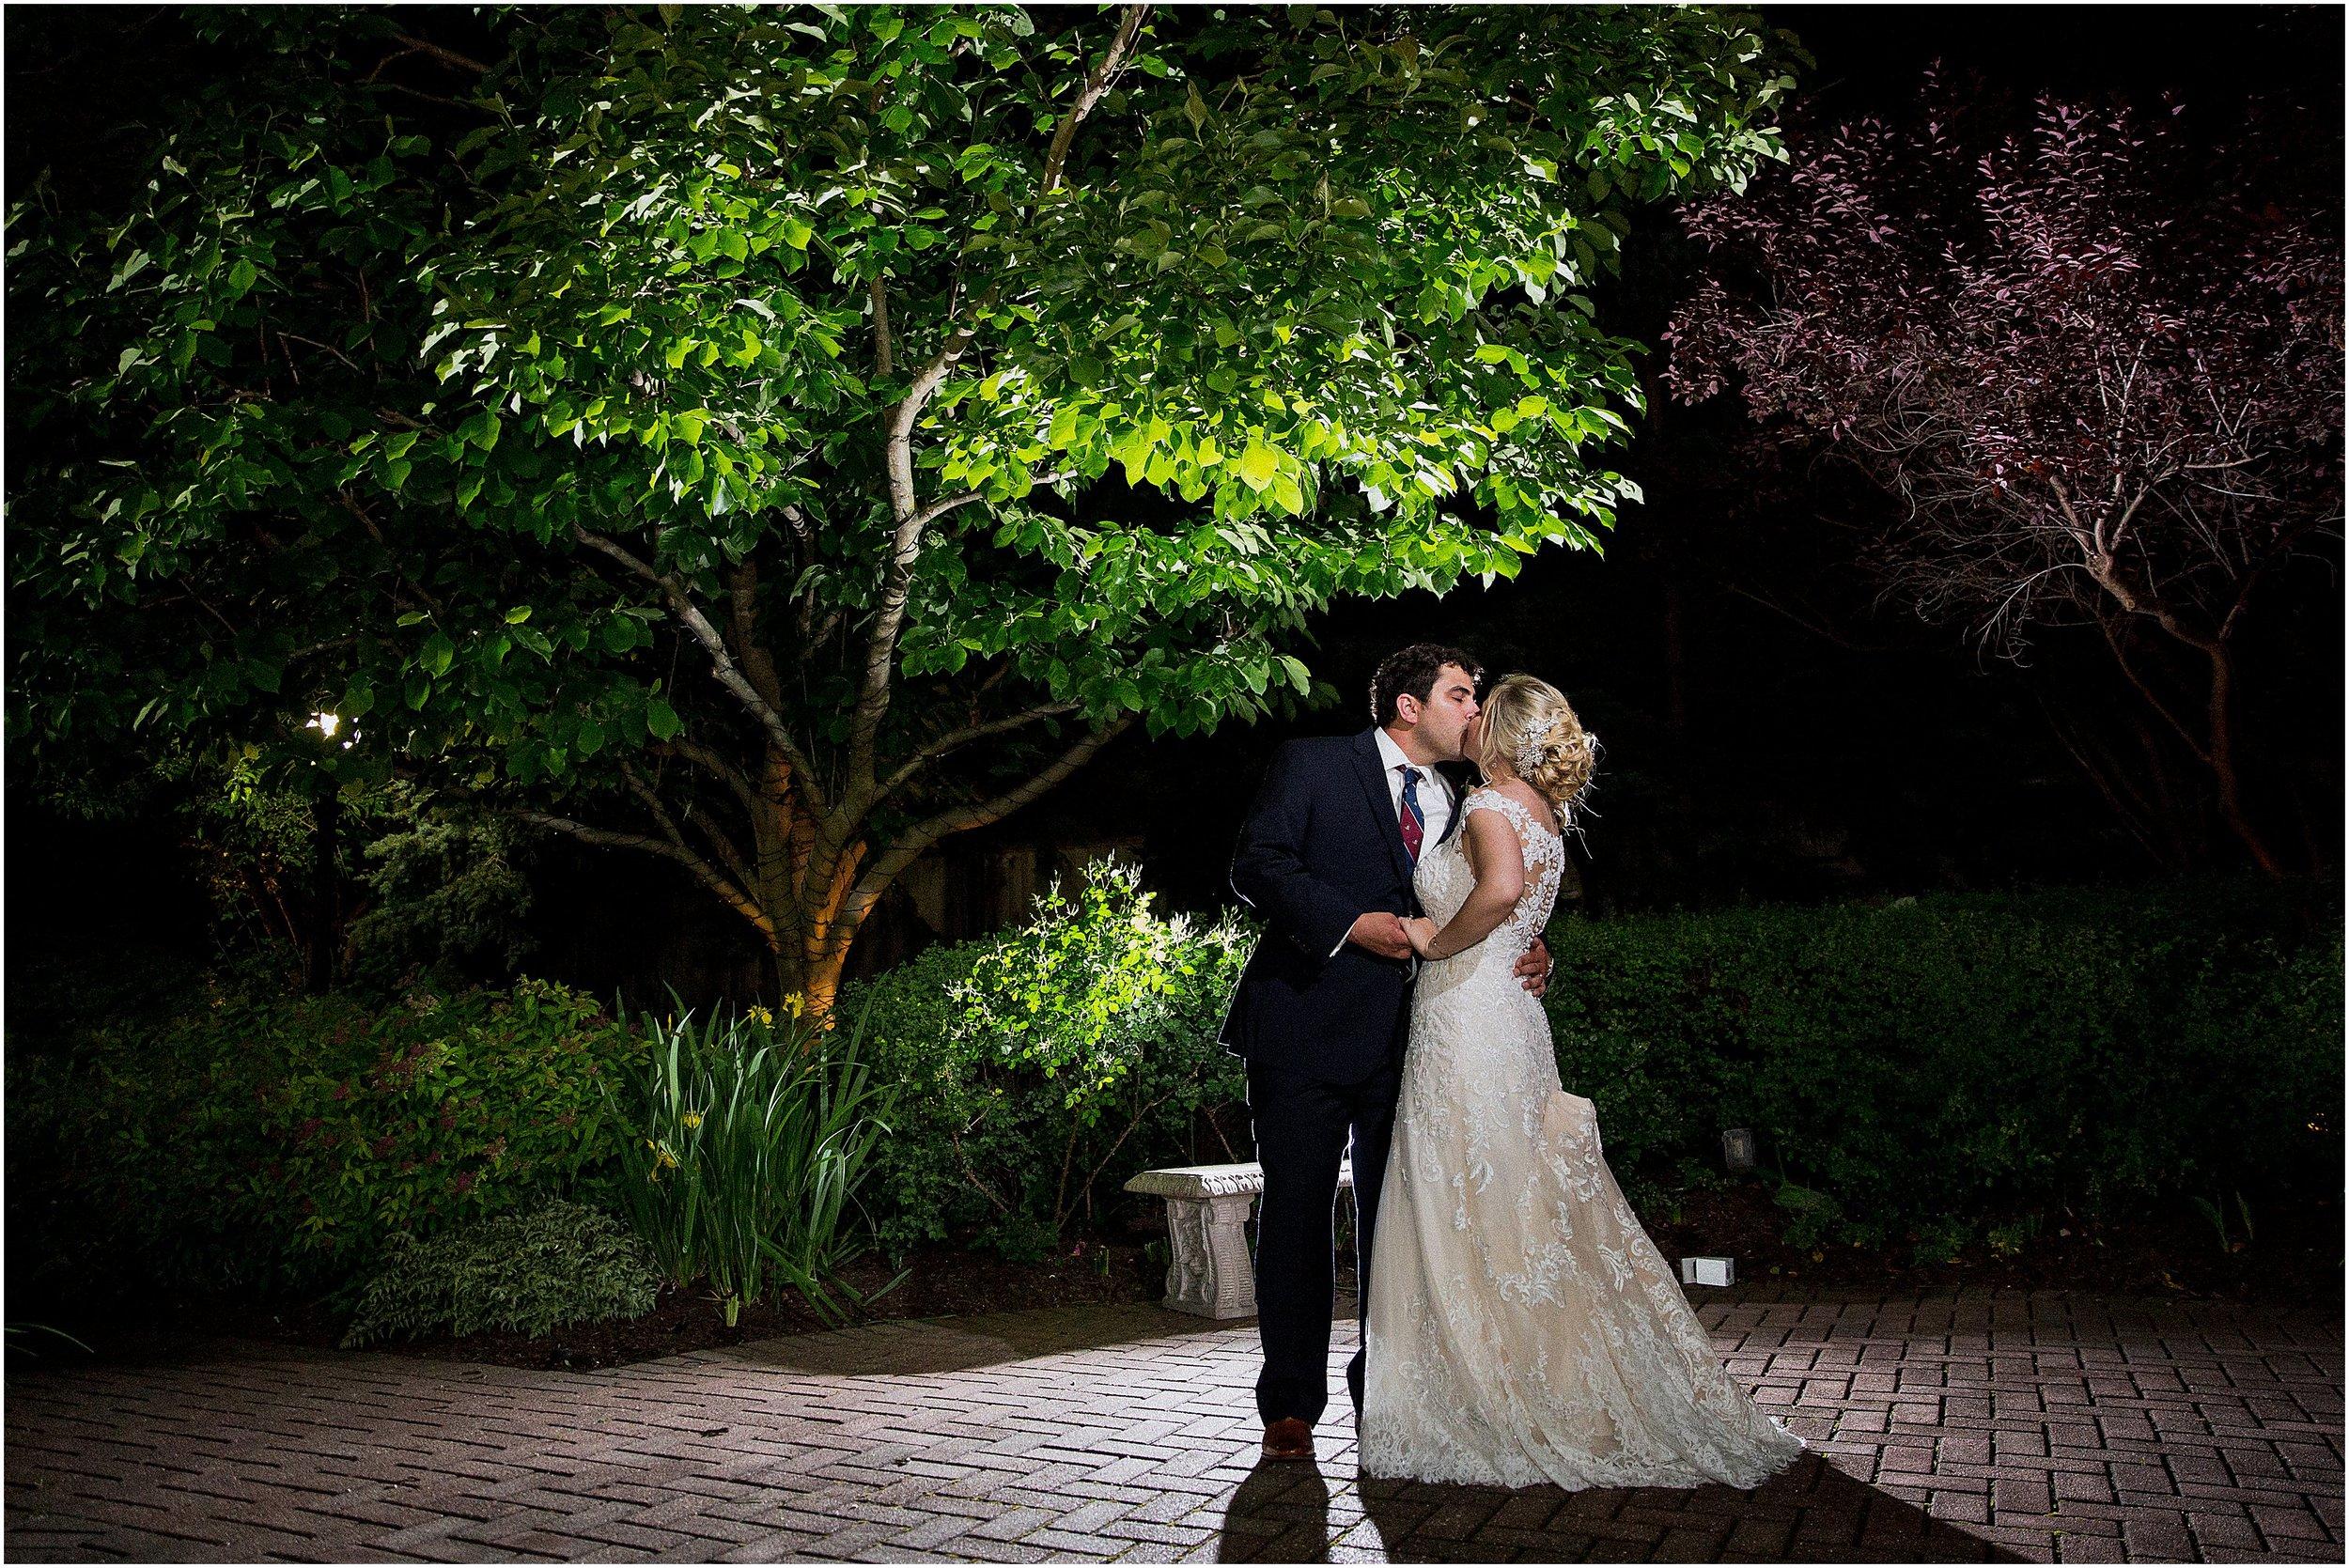 Philly_Wedding_Photographer_0061.jpg